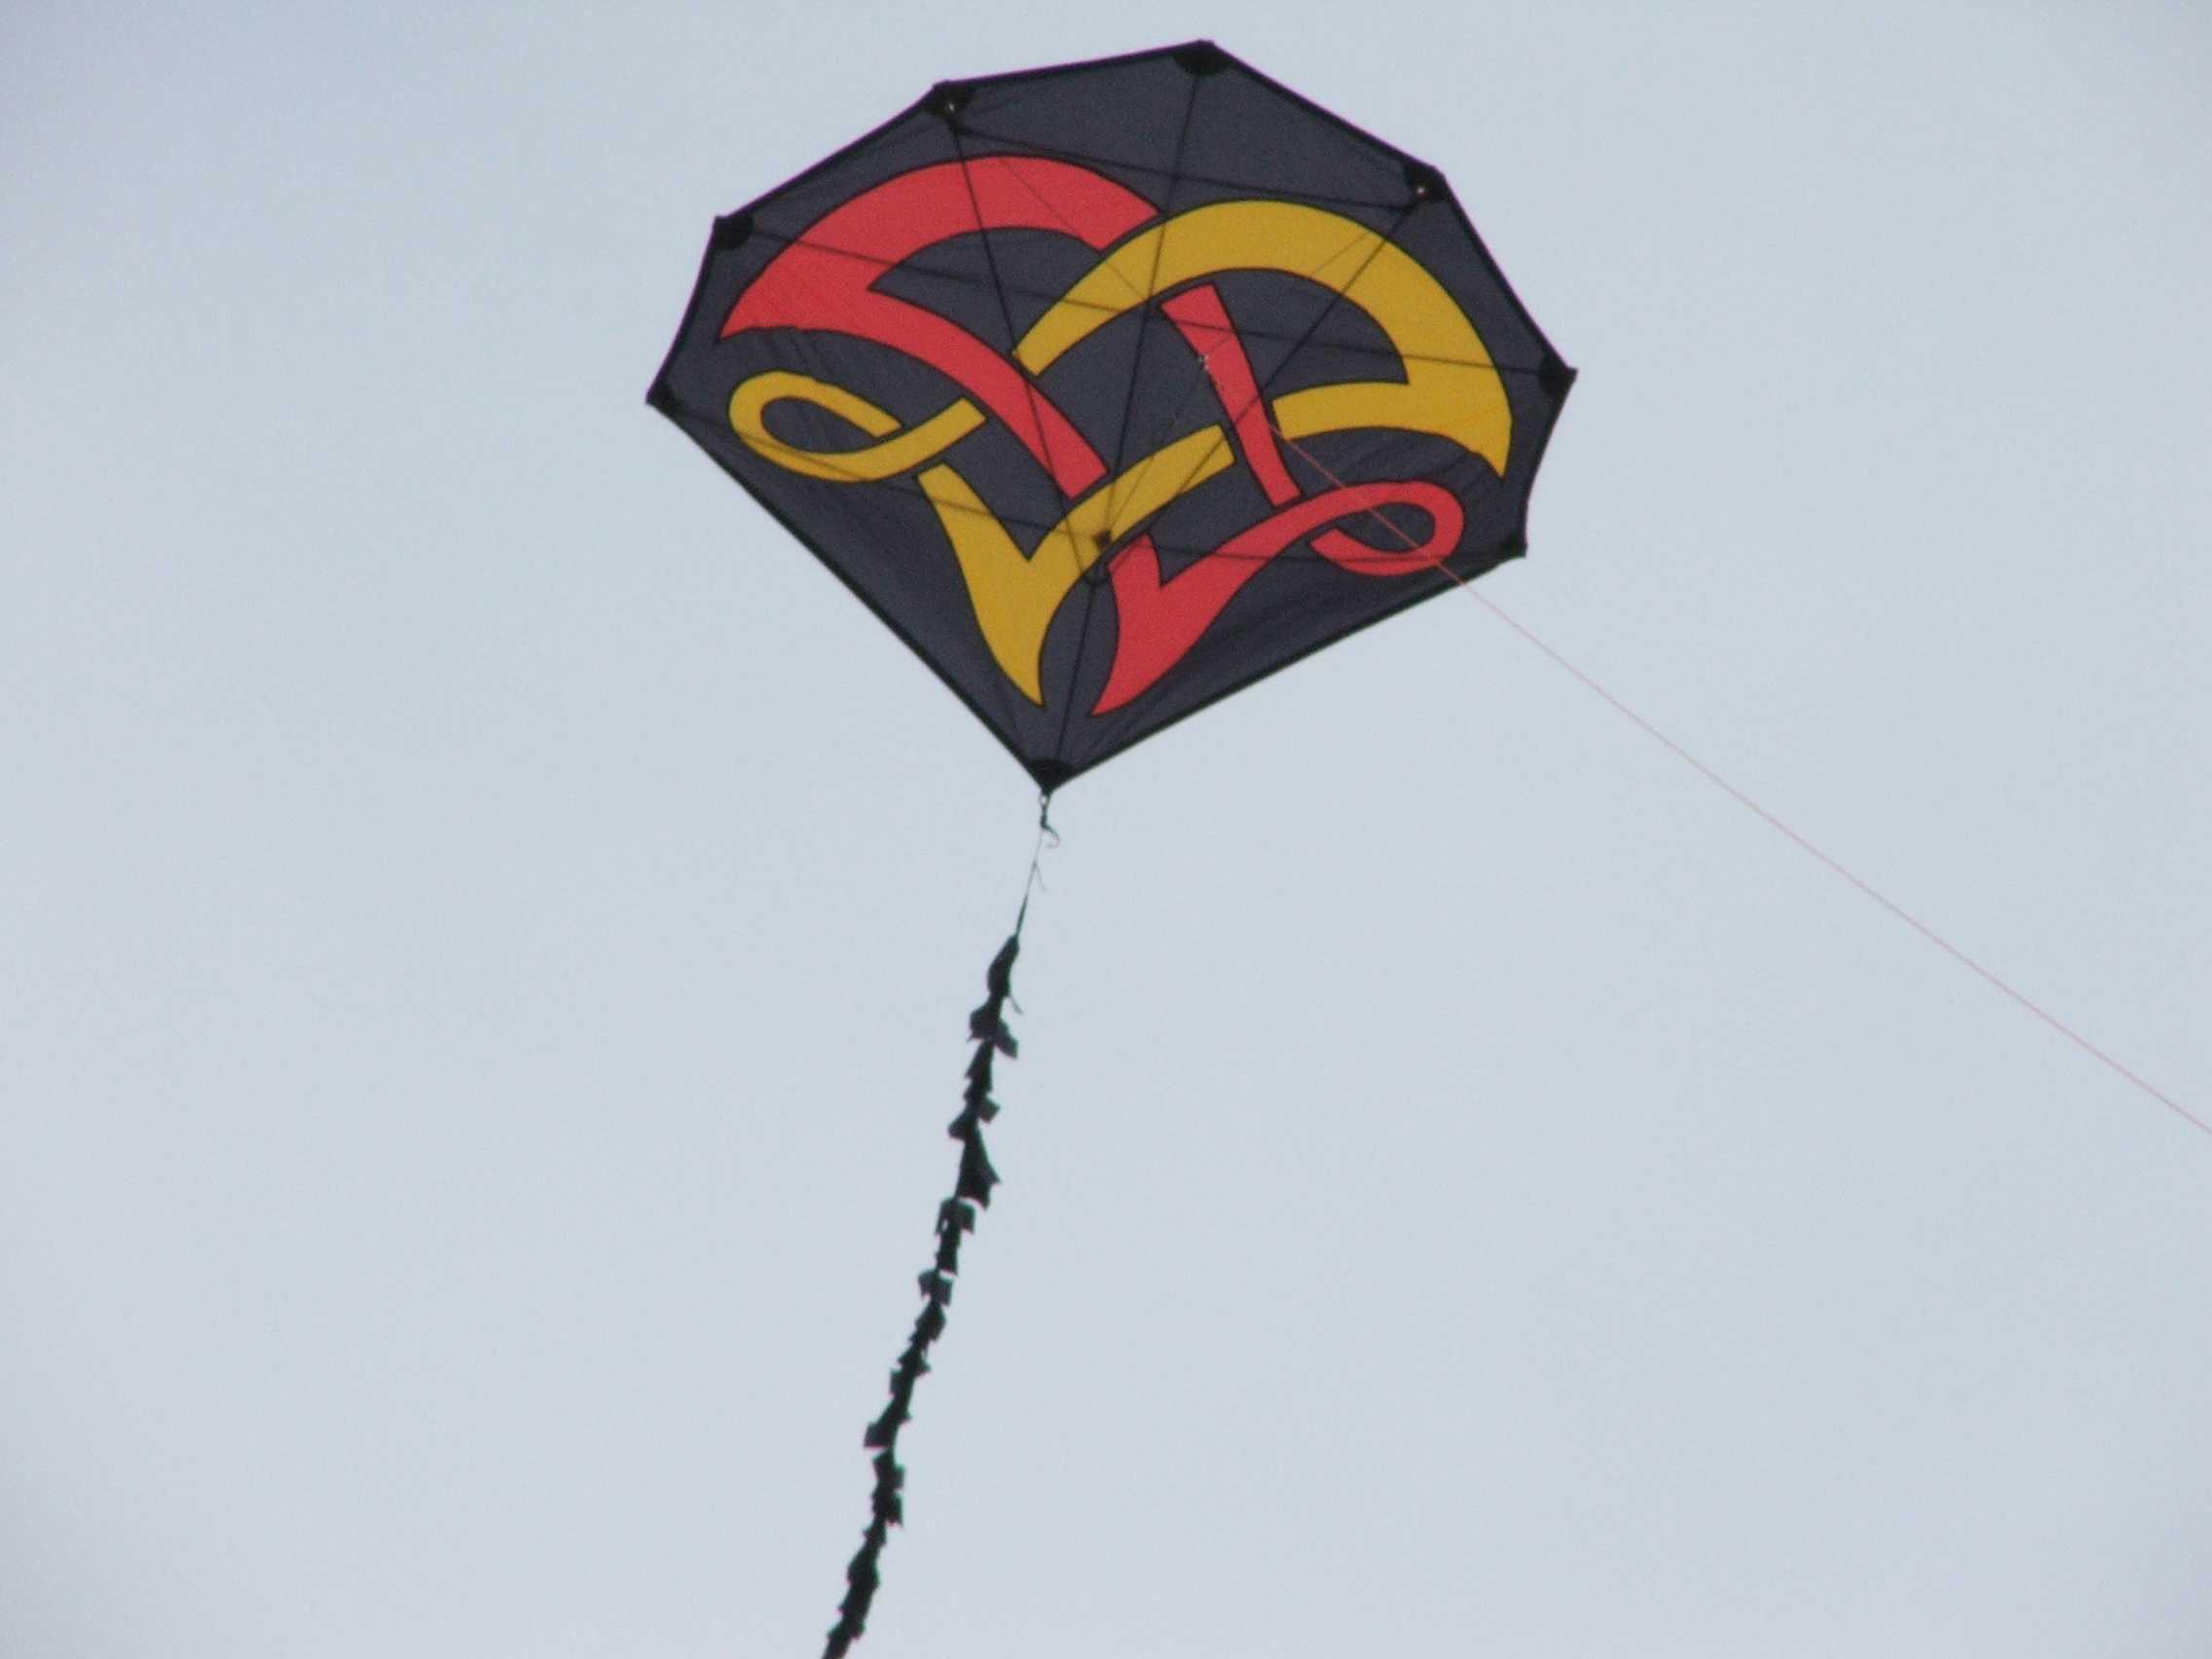 cool kite designs wwwmiifotoscom